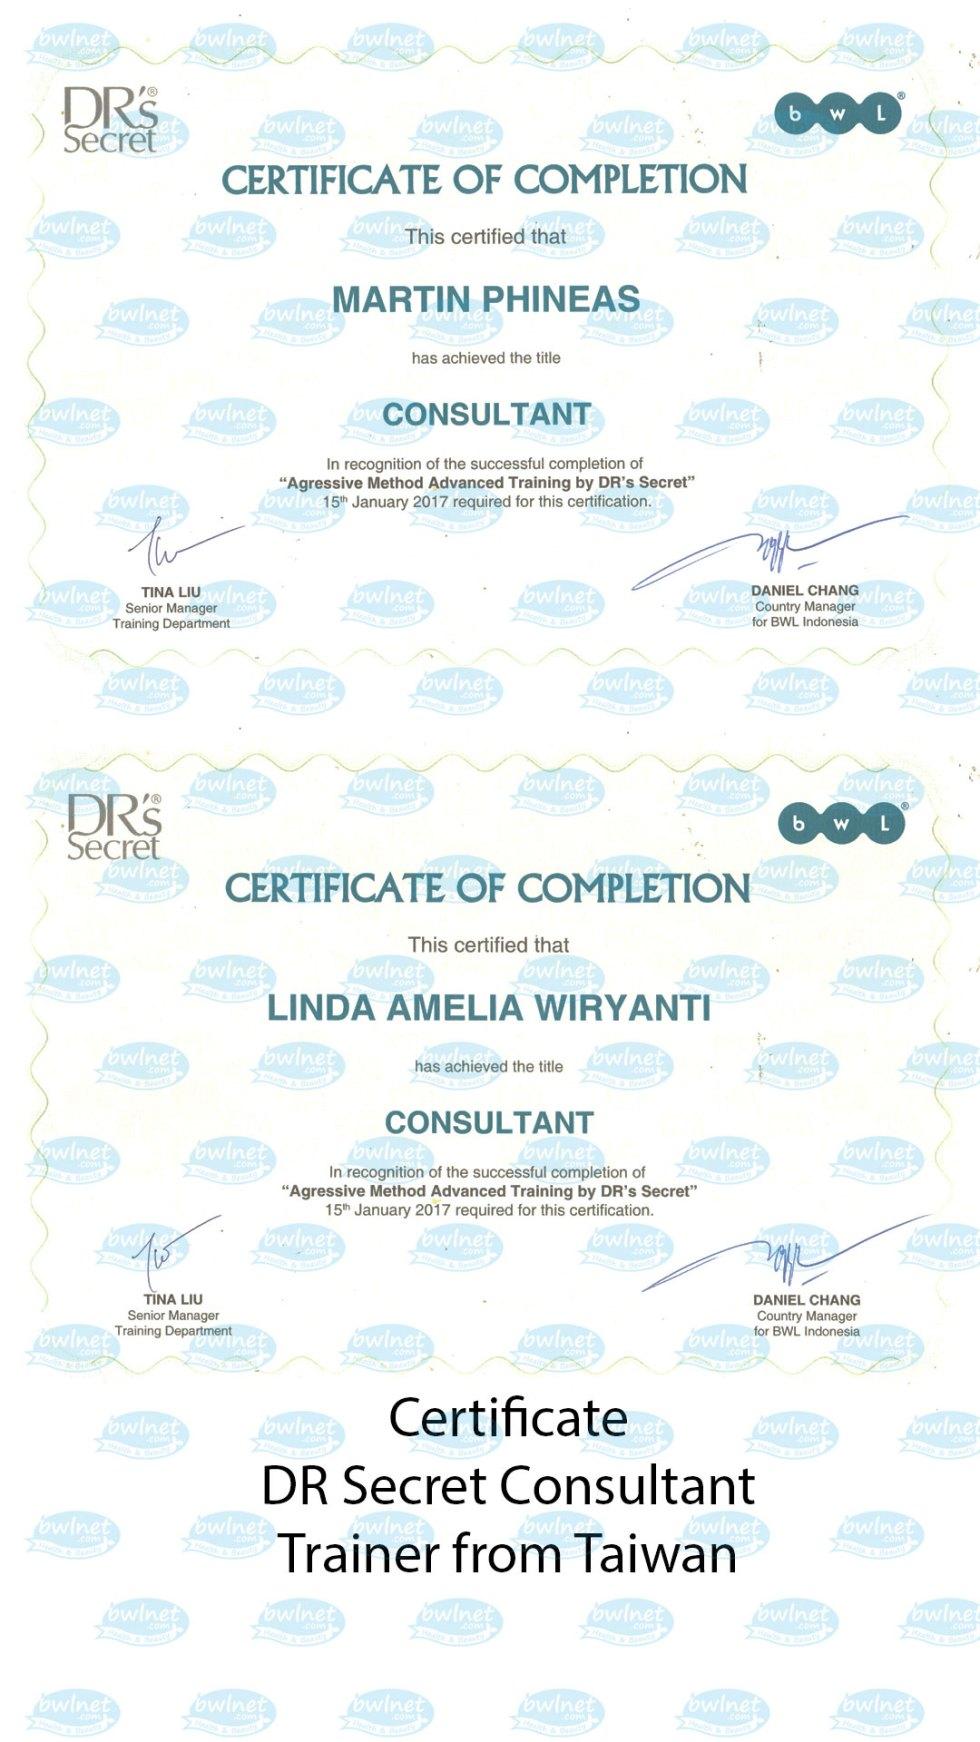 bwlnet-sertifikat-drsecret